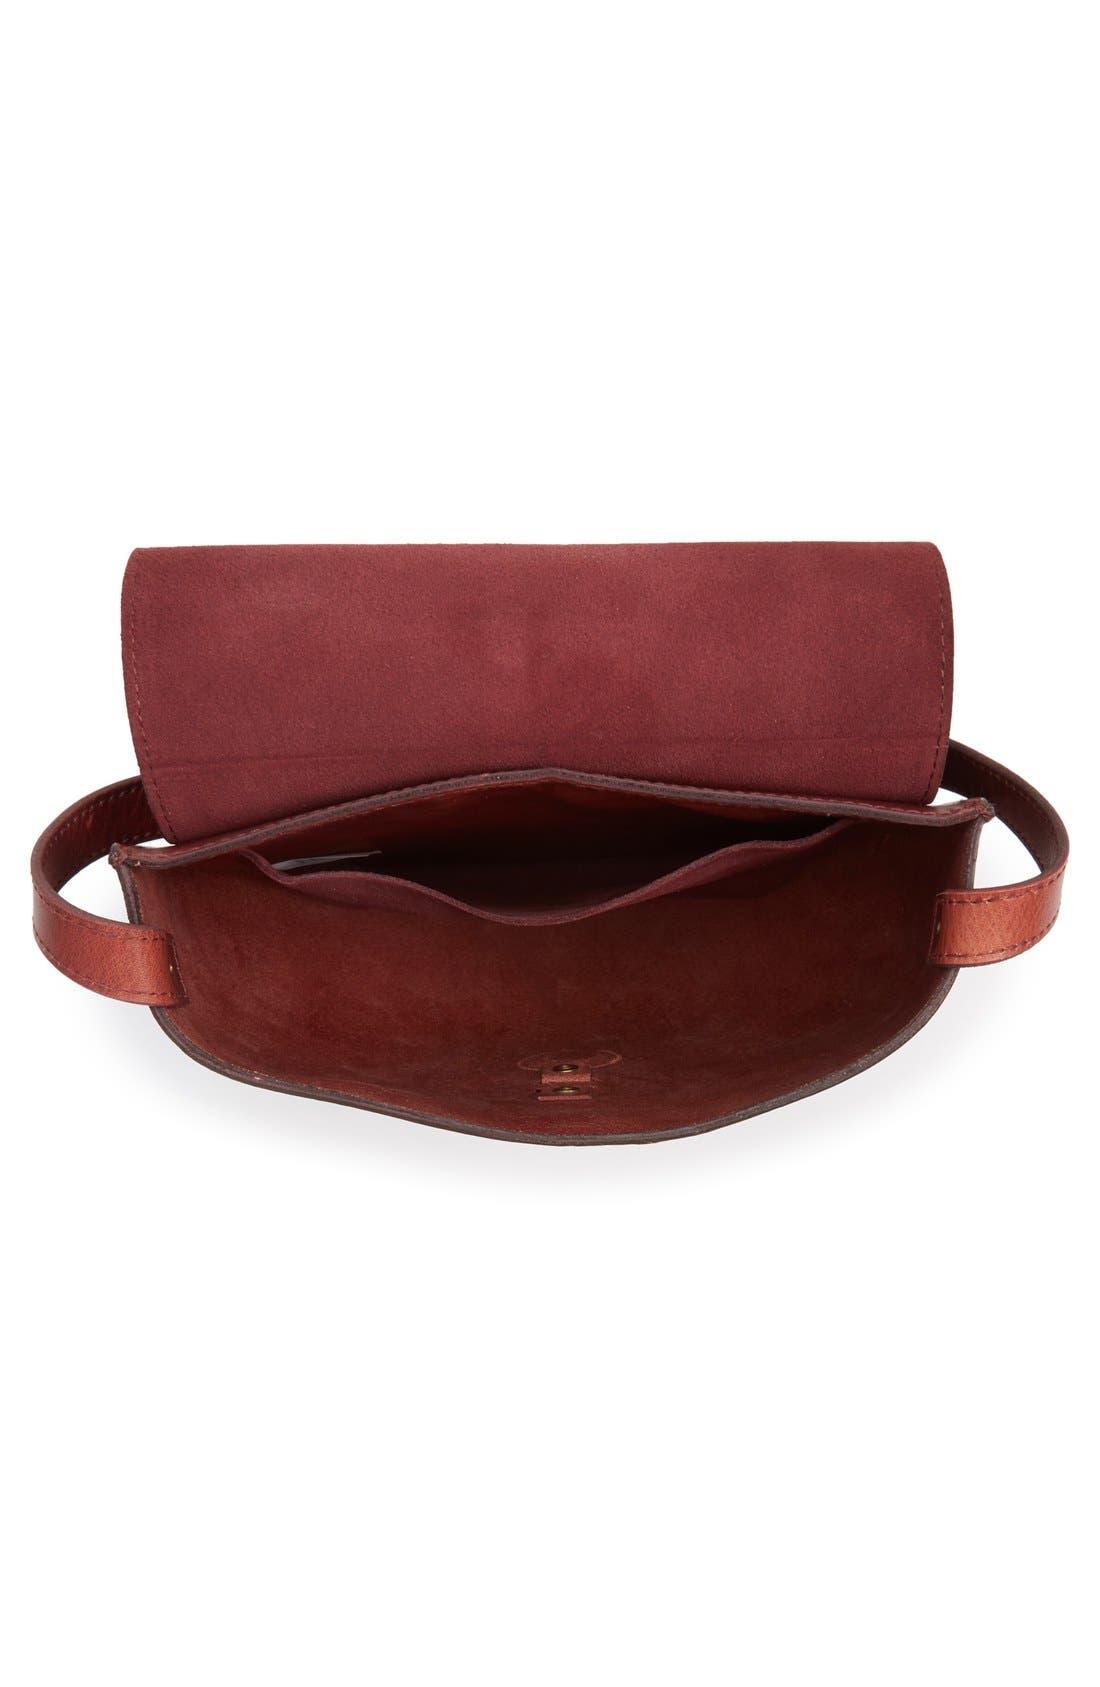 O-Ring Leather Saddle Bag,                             Alternate thumbnail 2, color,                             200